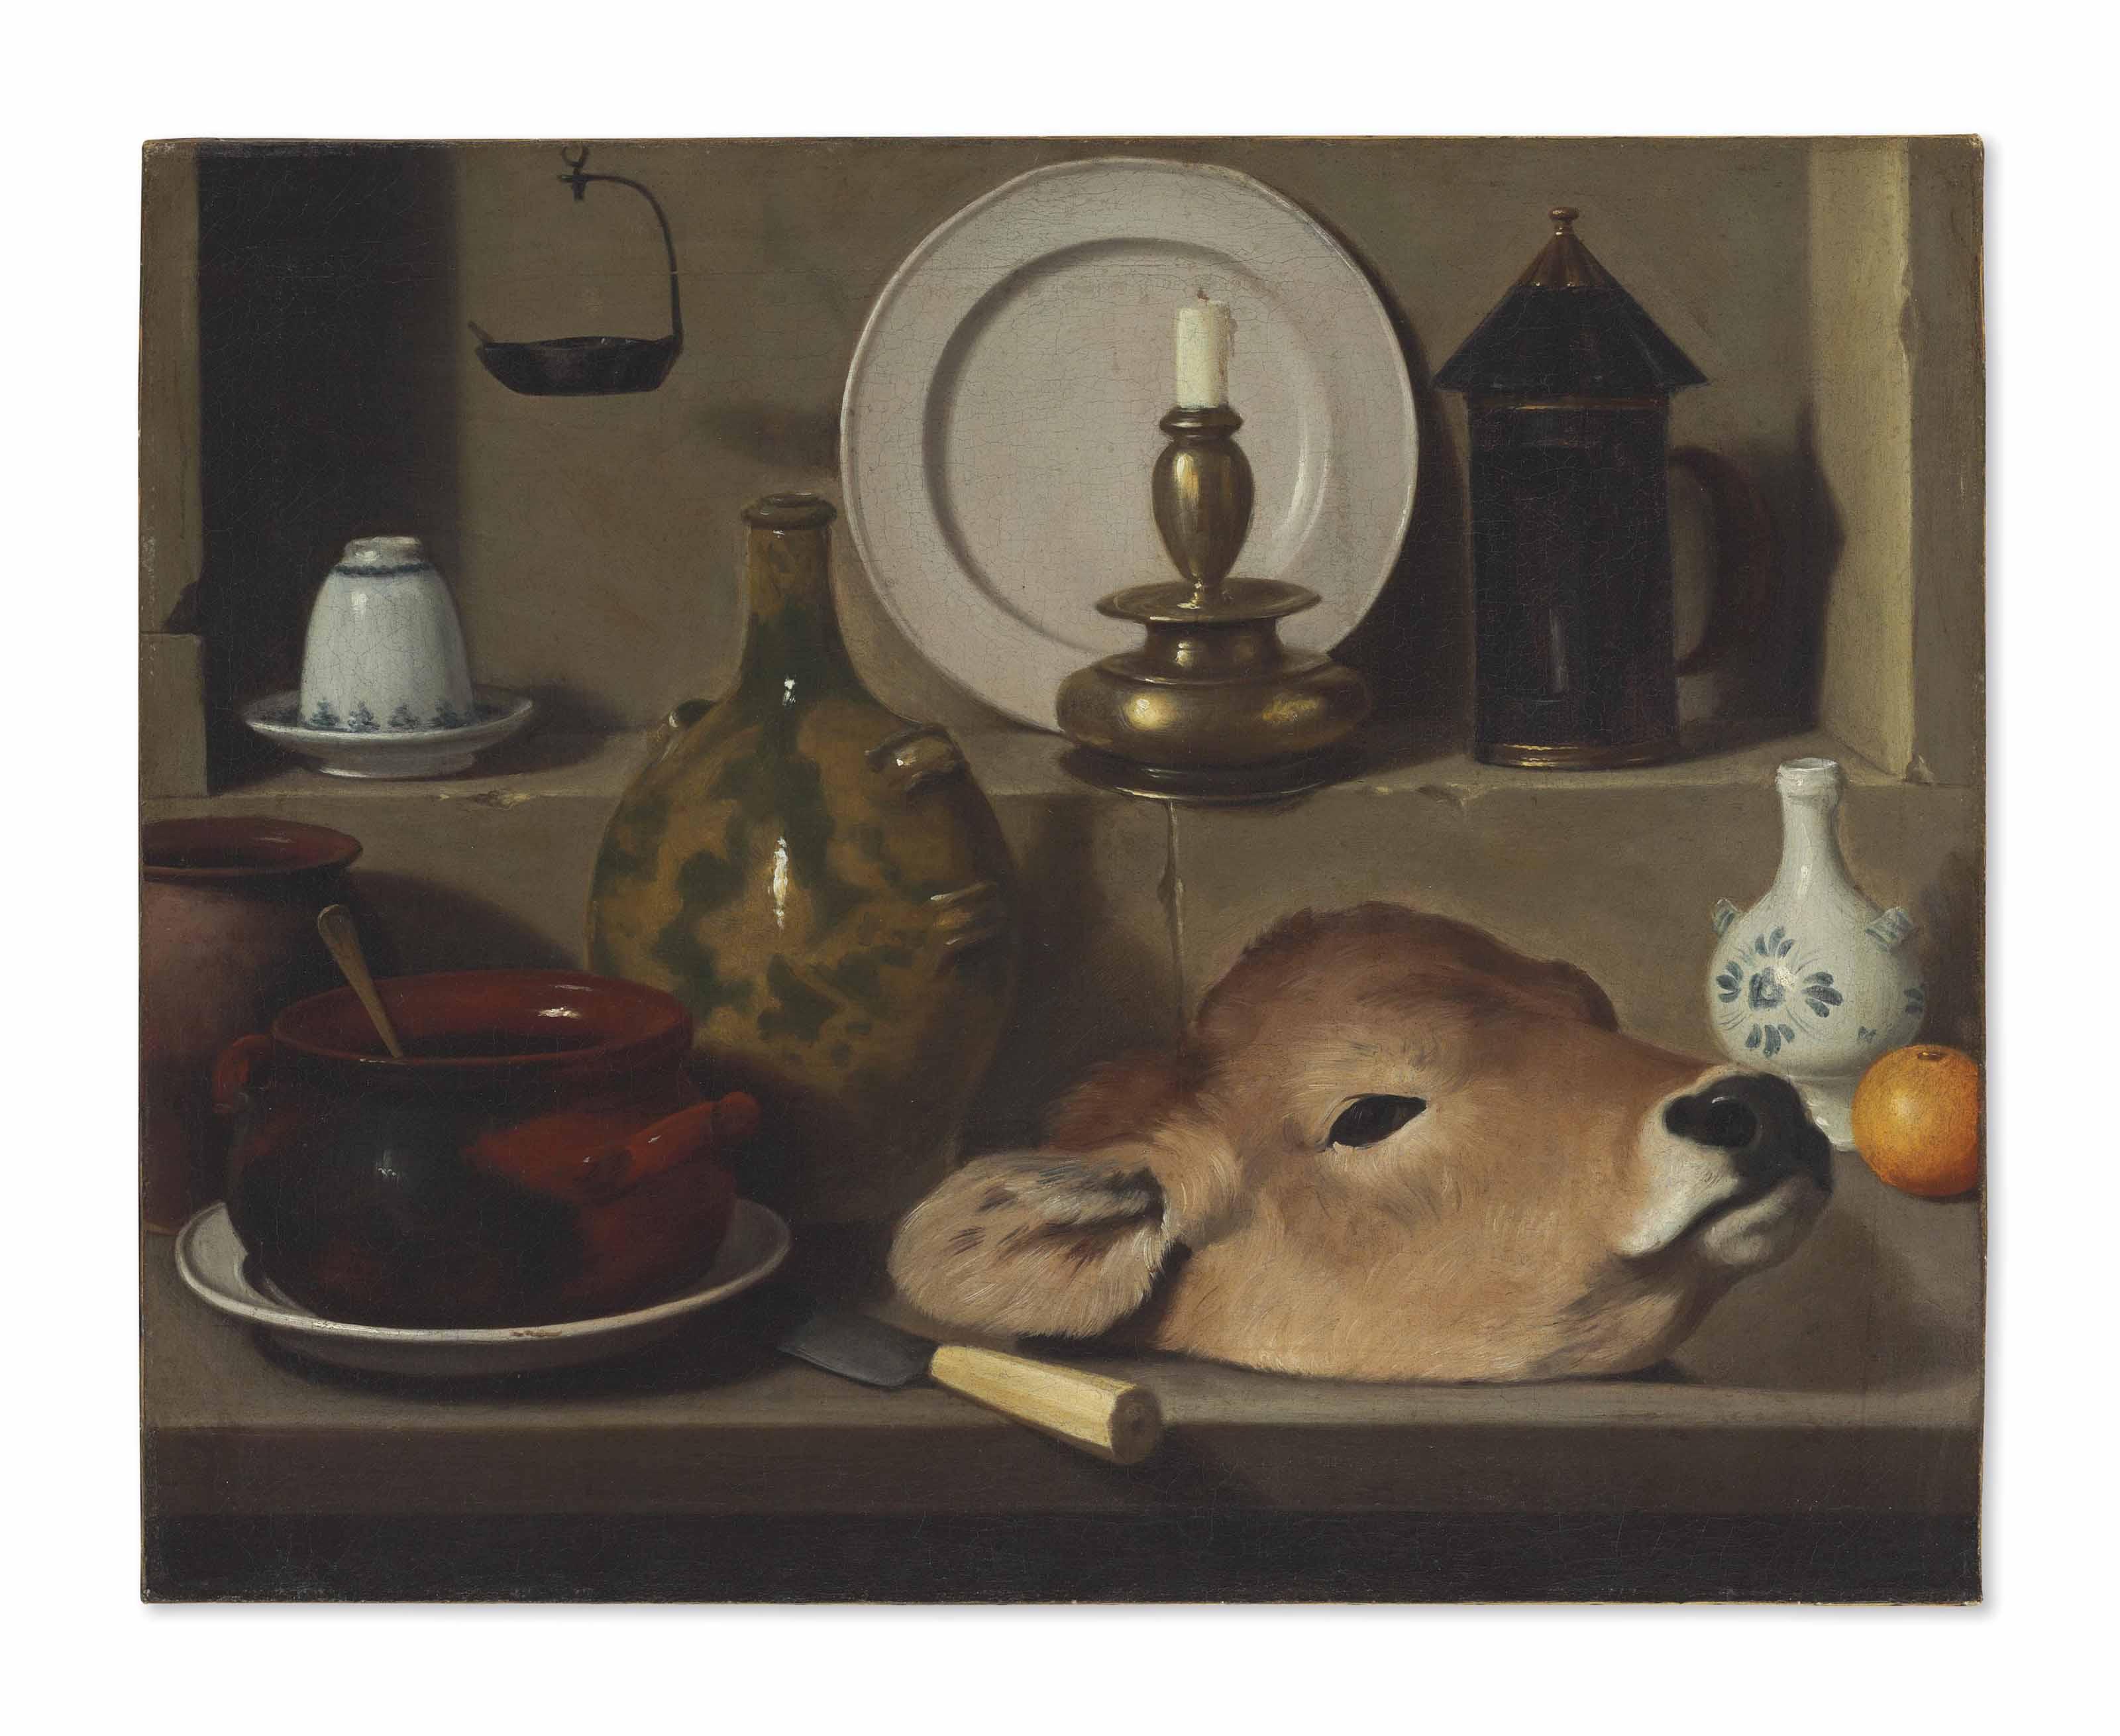 An oil lamp, ceramics, brass lantern, knife, onion and calf's head